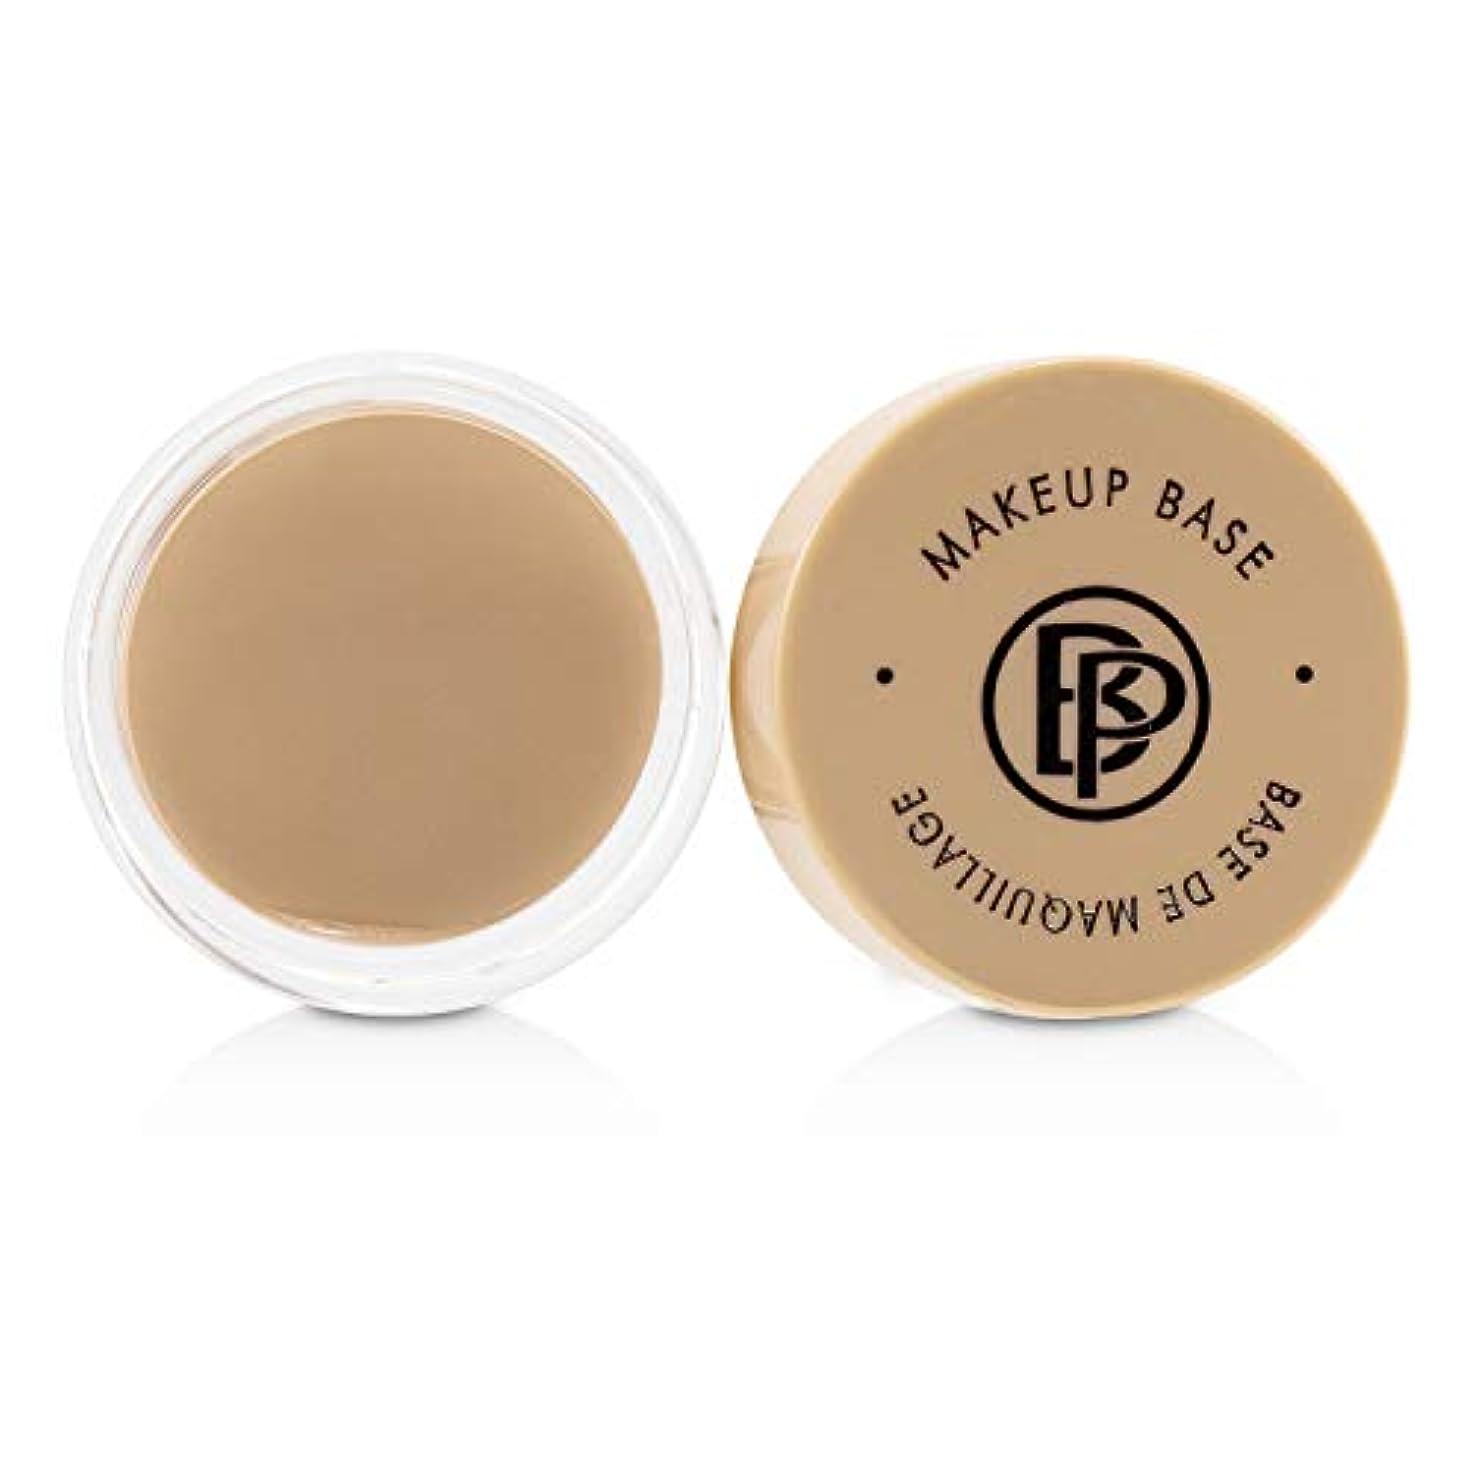 縁石アリス上院議員Bellapierre Cosmetics Makeup Base 5g/0.176oz並行輸入品